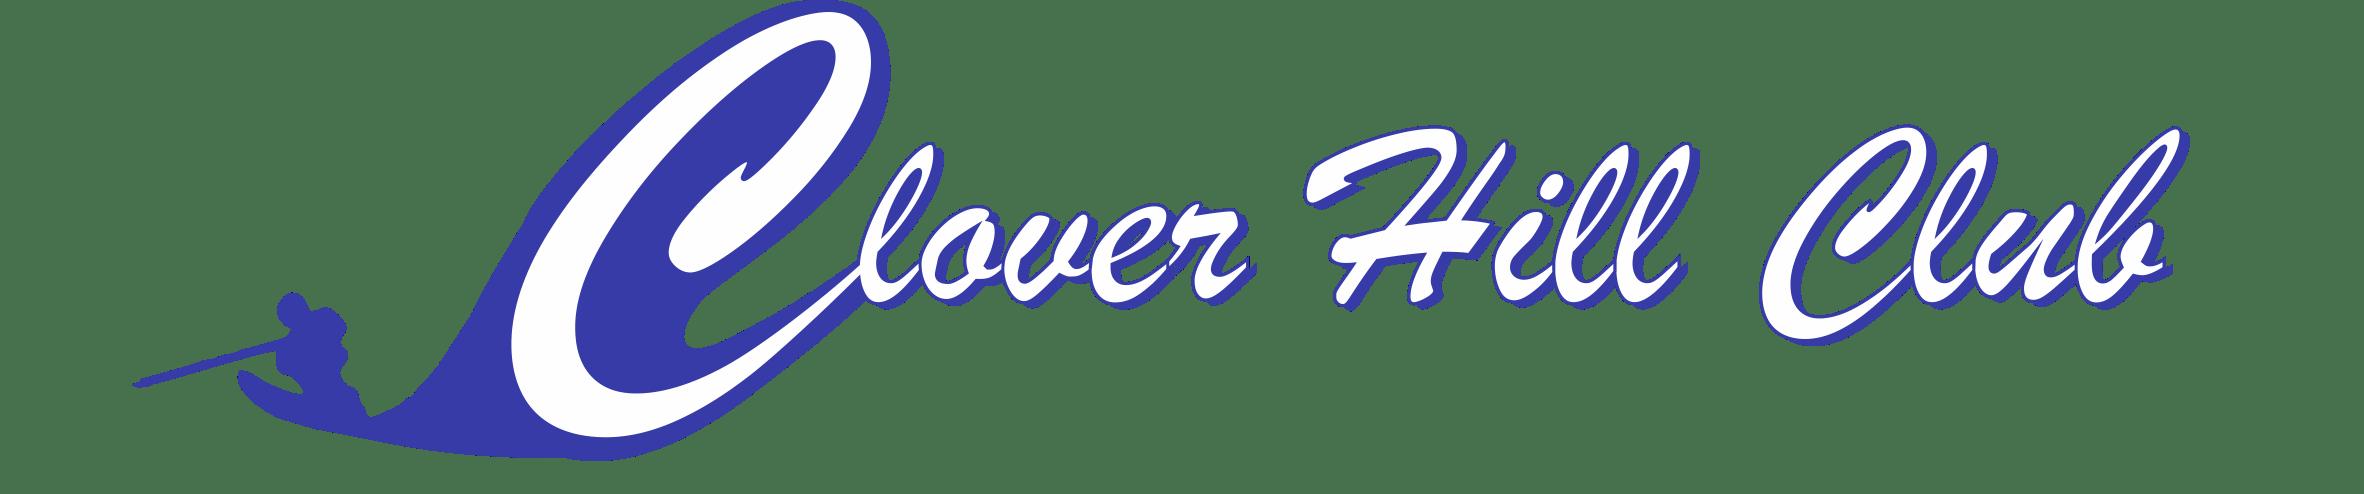 Clover Hill Club Logo